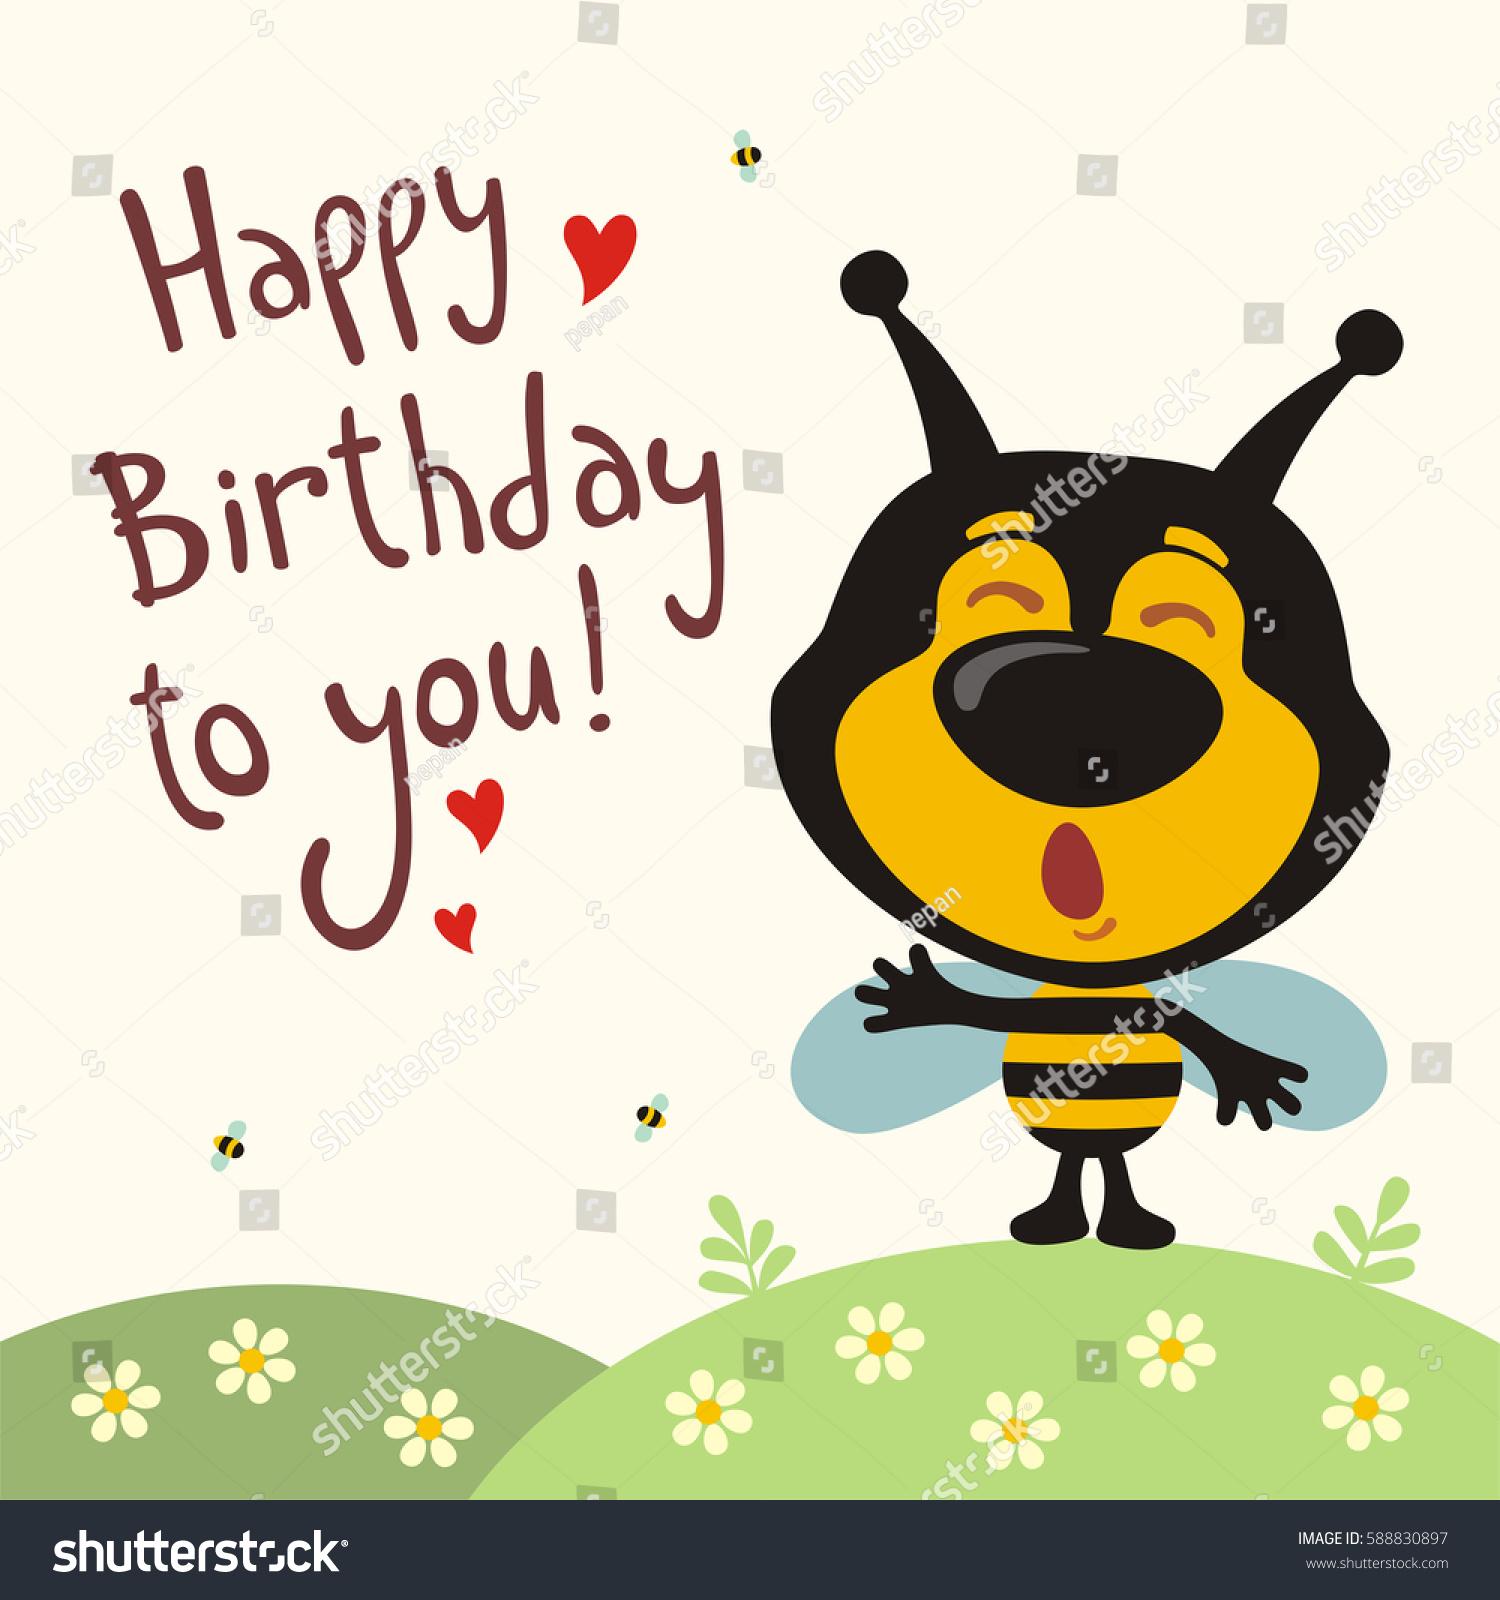 Happy Birthday You Funny Bee Sings Stock Vector 588830897